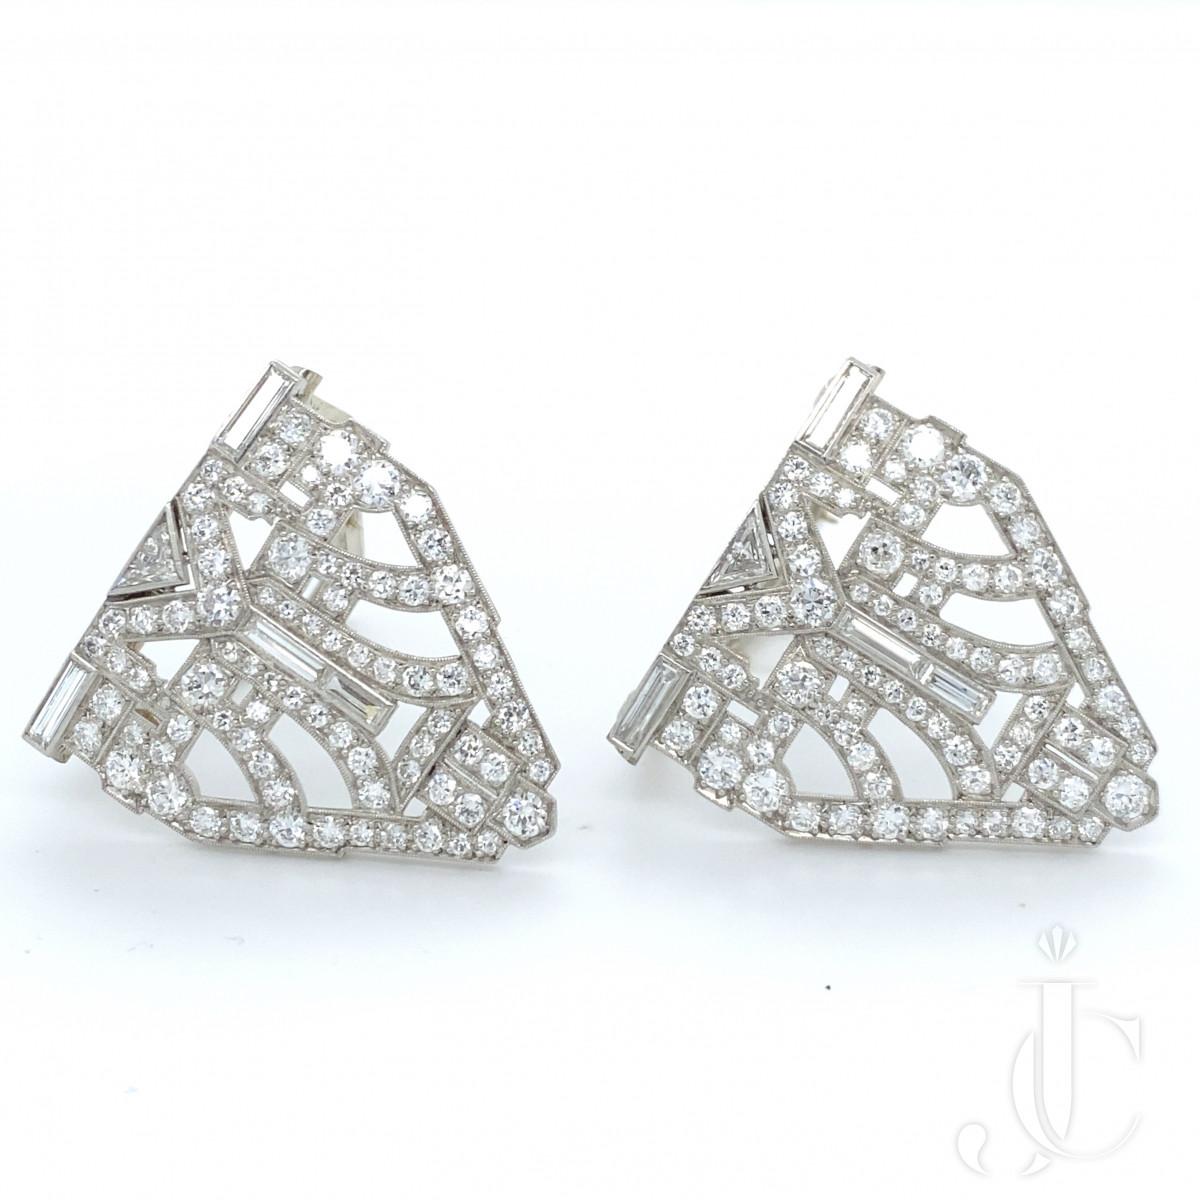 Diamond clips